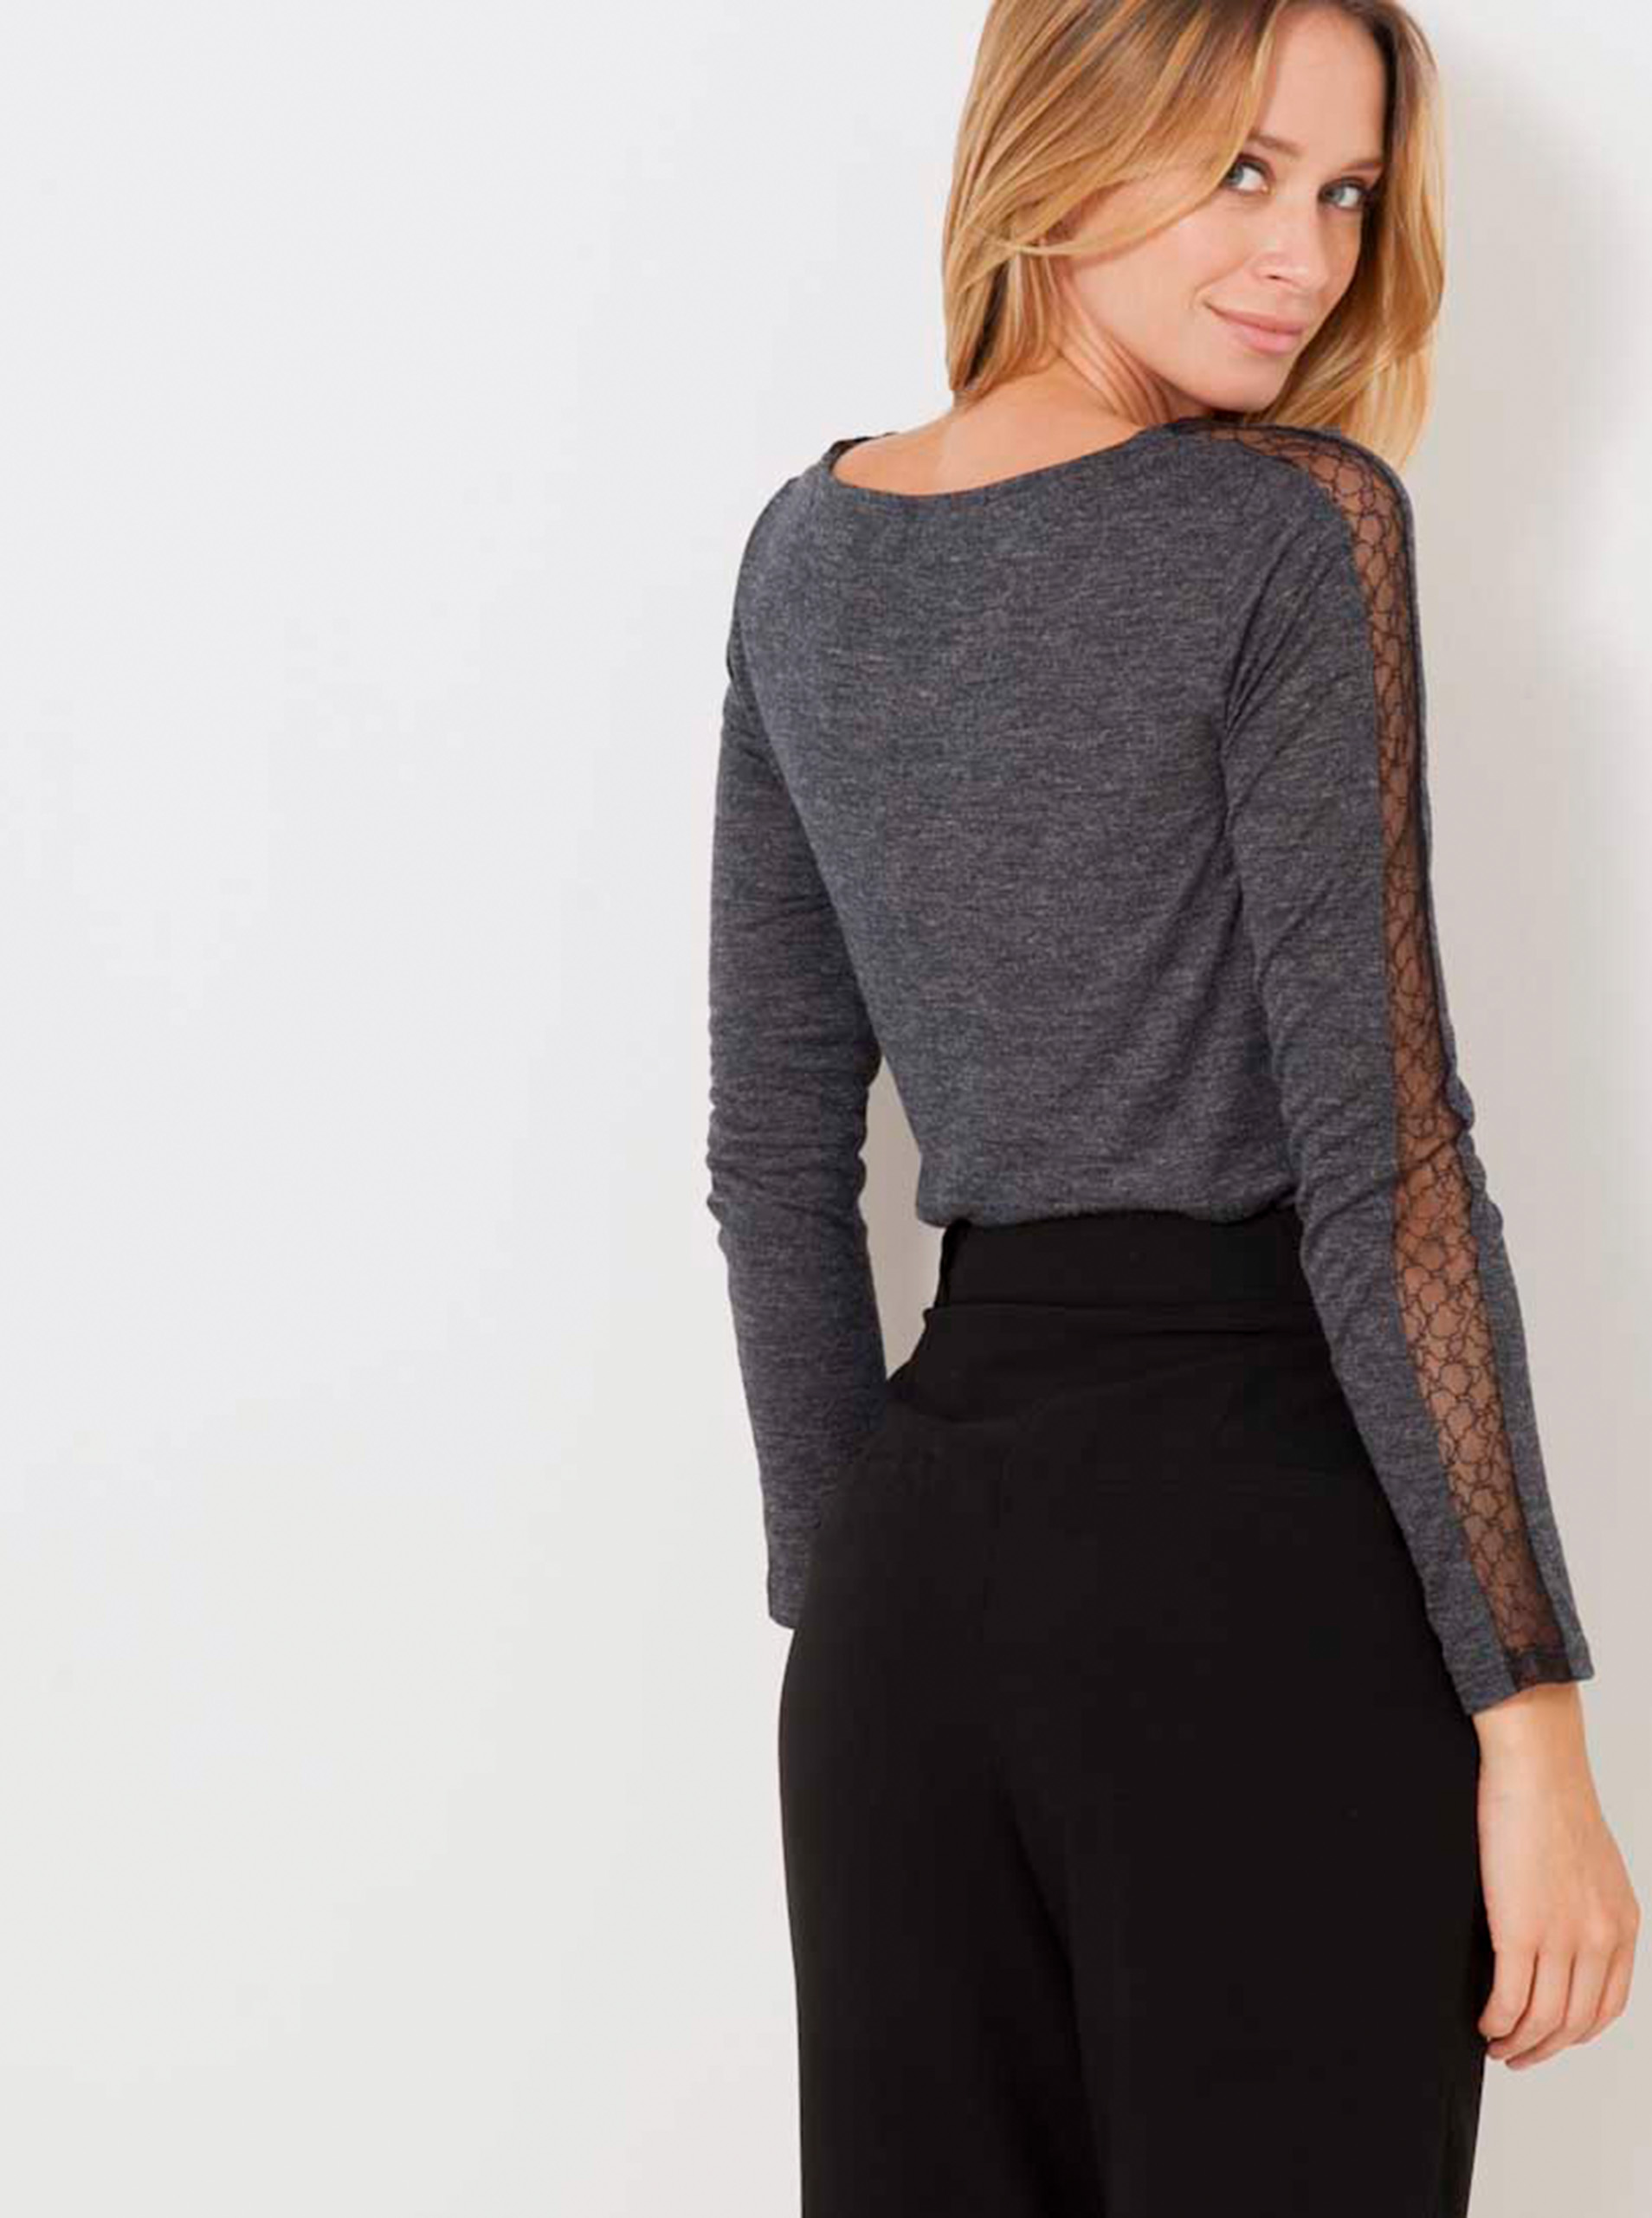 CAMAIEU Women's t-shirt grey